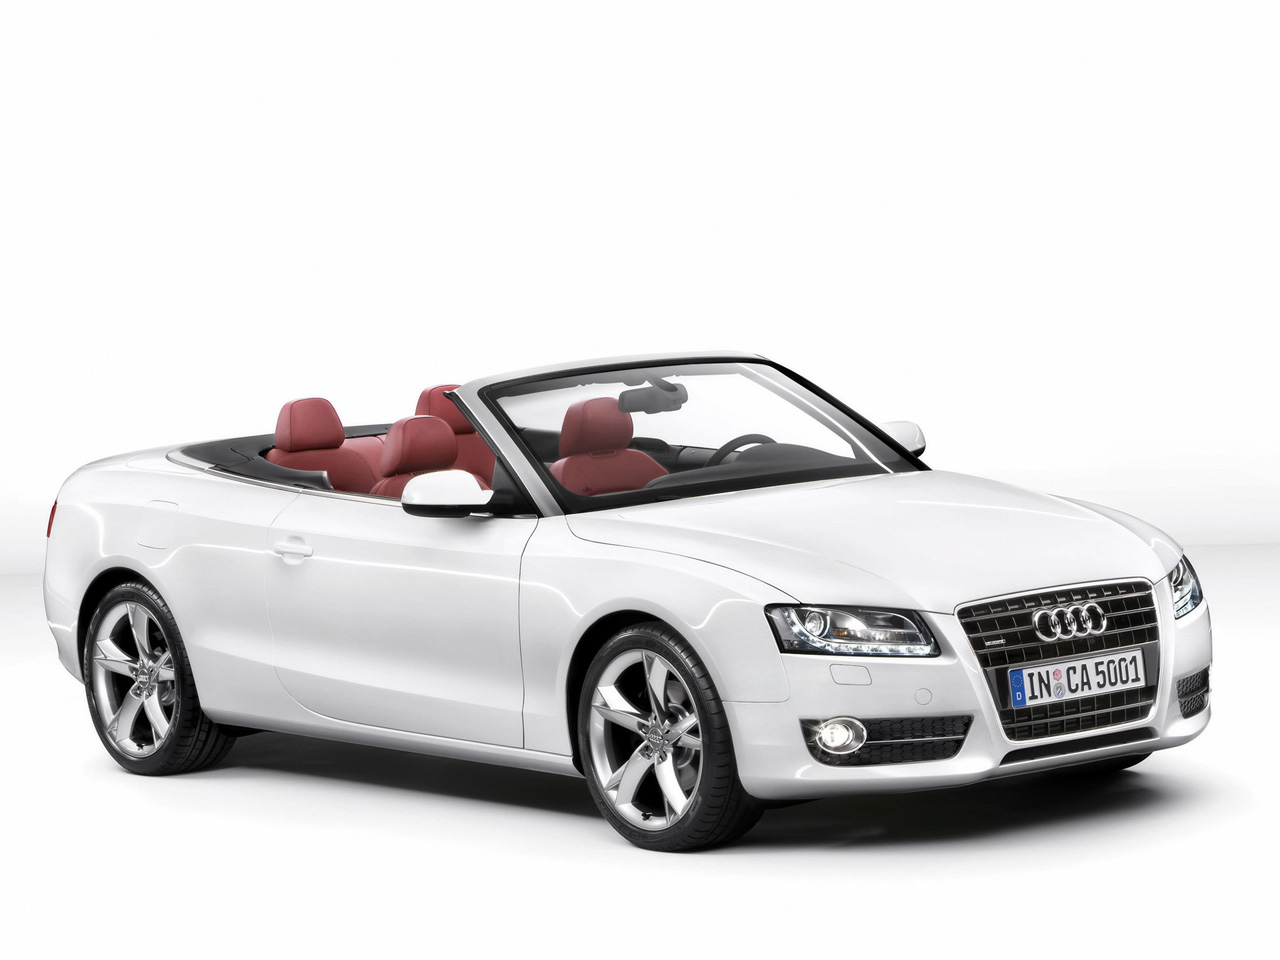 http://3.bp.blogspot.com/-dPYgdNl_ipQ/TbfwJ8RV7-I/AAAAAAAAAOk/khNHZ23Q2Vs/s1600/Audi-A5-Convertible-Front-And-Side-1280x960.jpg